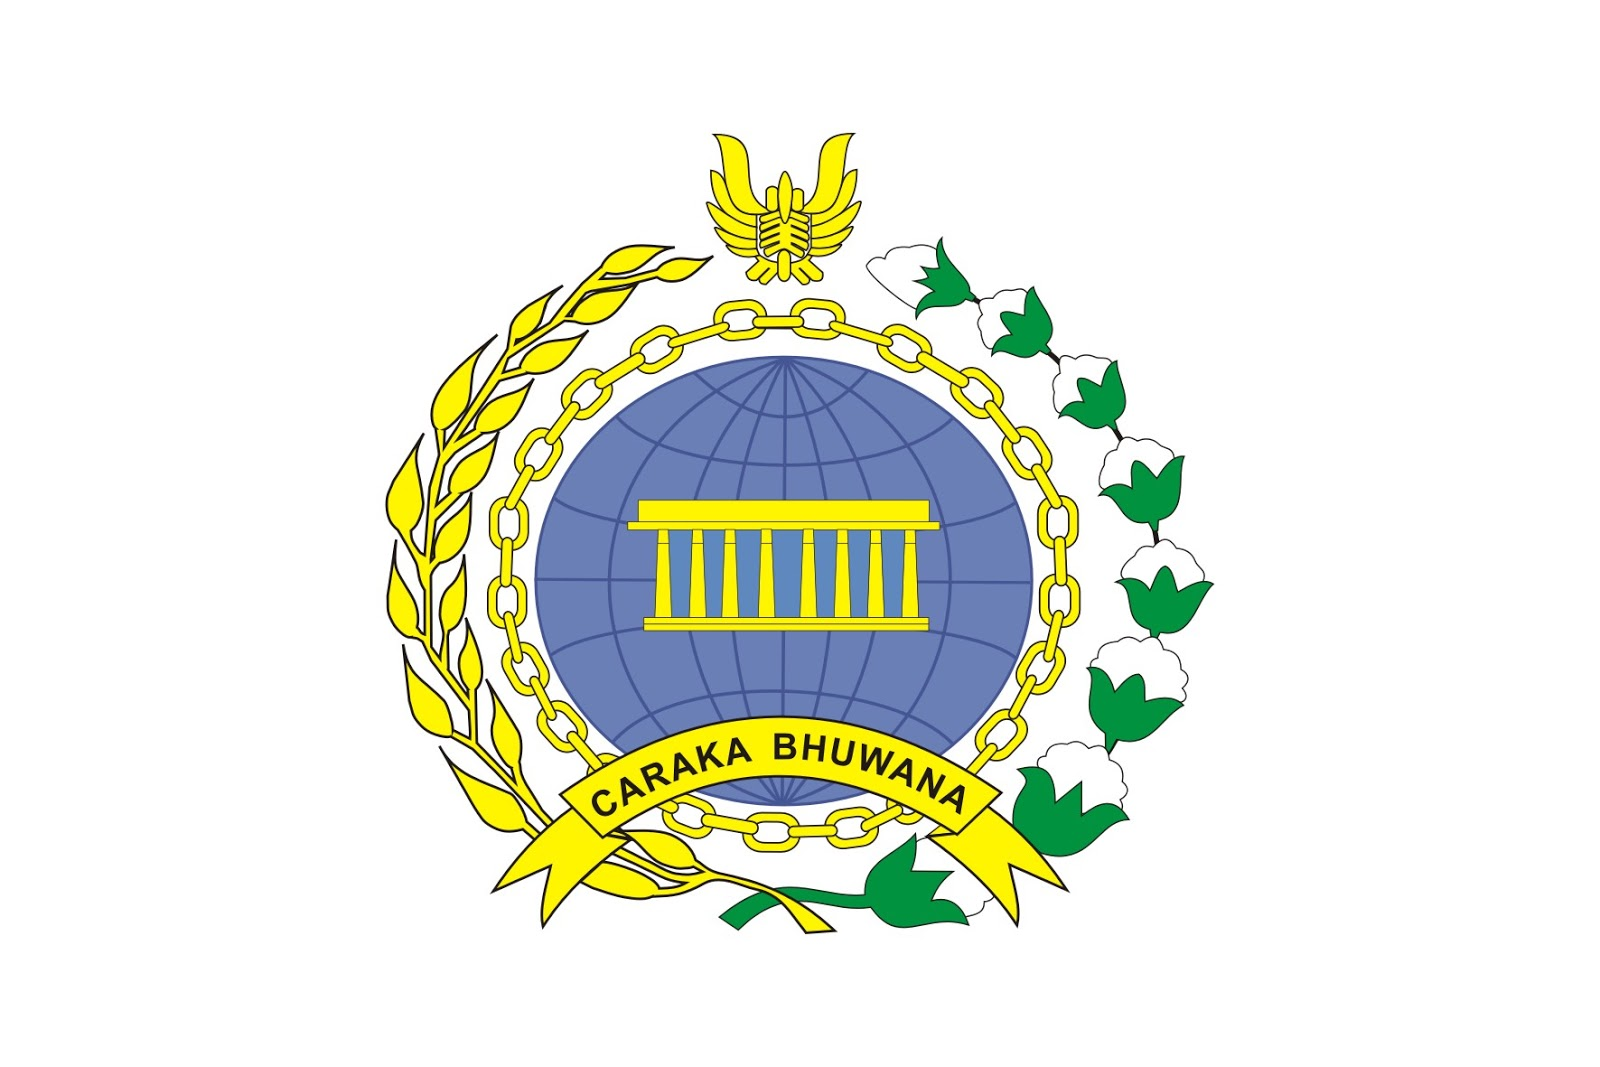 Kementerian Luar Negeri Logo